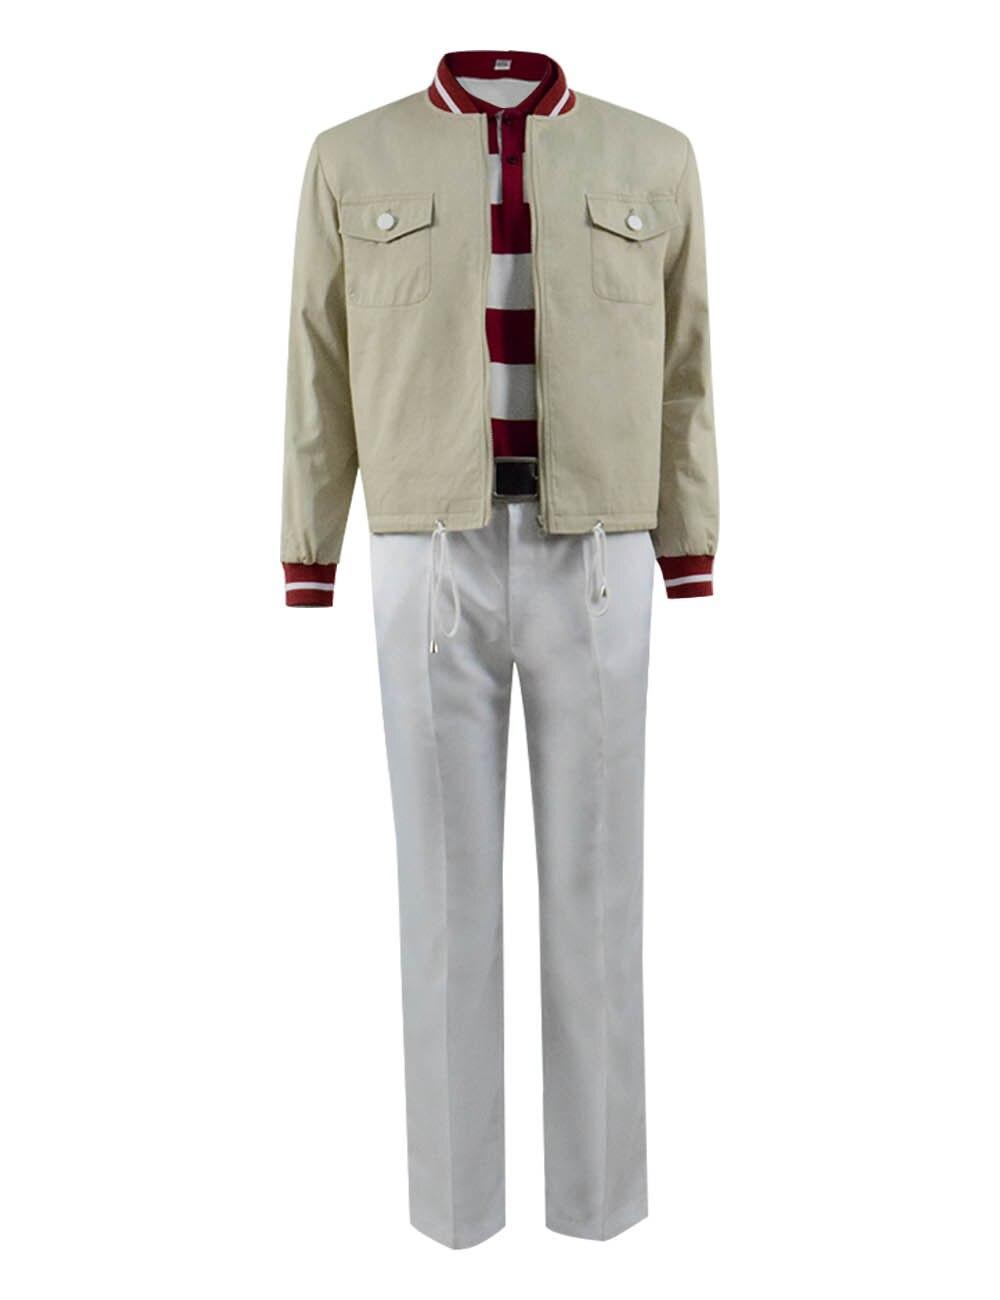 Generous The Truman Show Truman Burbank Cosplay Costume Men Suit Baseball Jacket Full Set